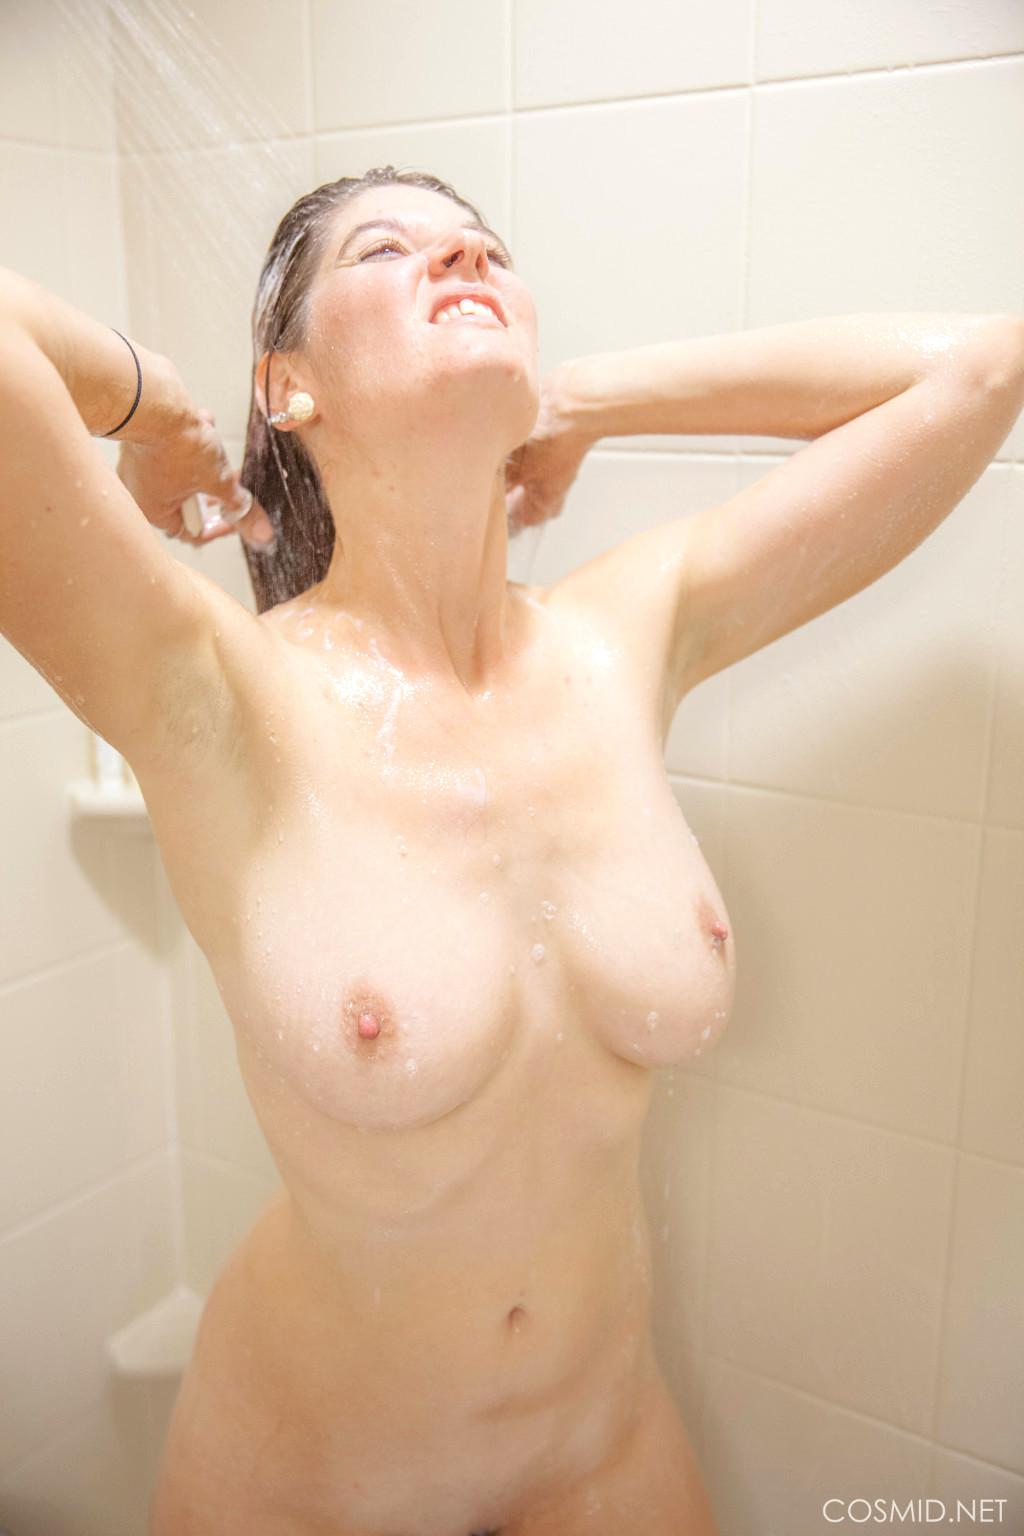 Babe Today Cosmid Ashlynn Brooks Nude Shower Fetish Porn Pics-7055